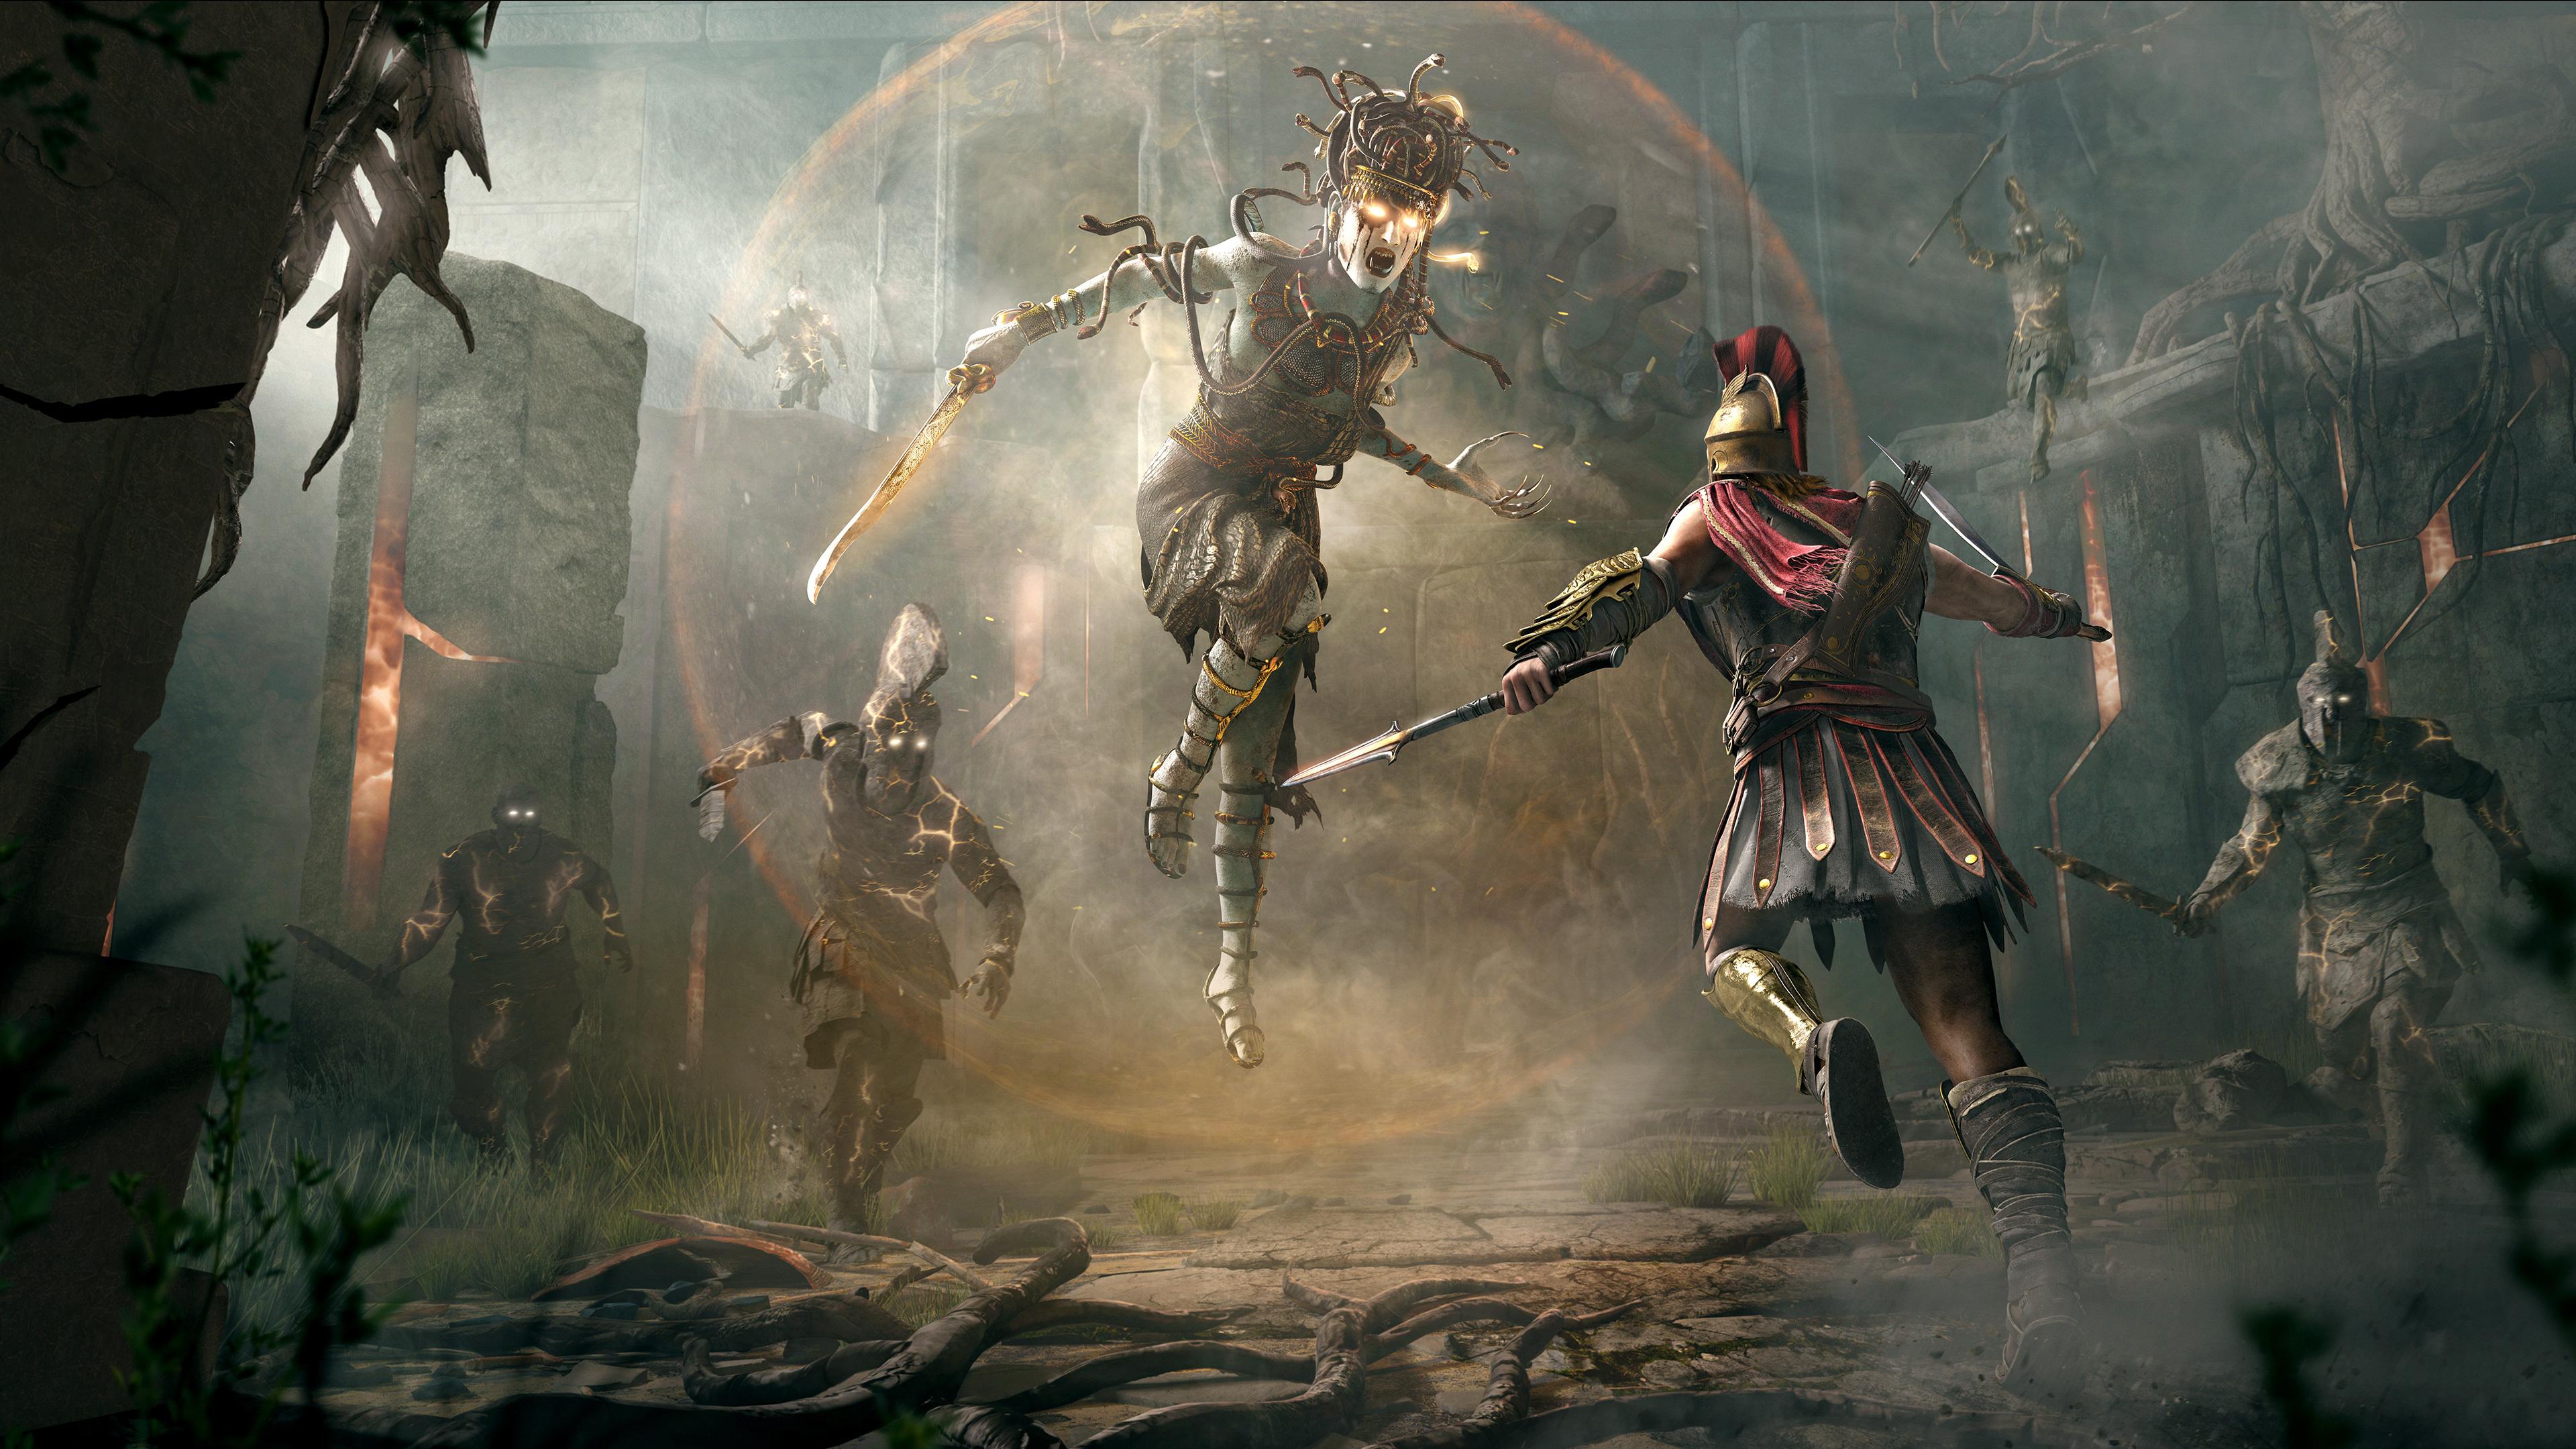 3840x2160 Assassins Creed Odyssey Fight 4k 4k Hd 4k Wallpapers